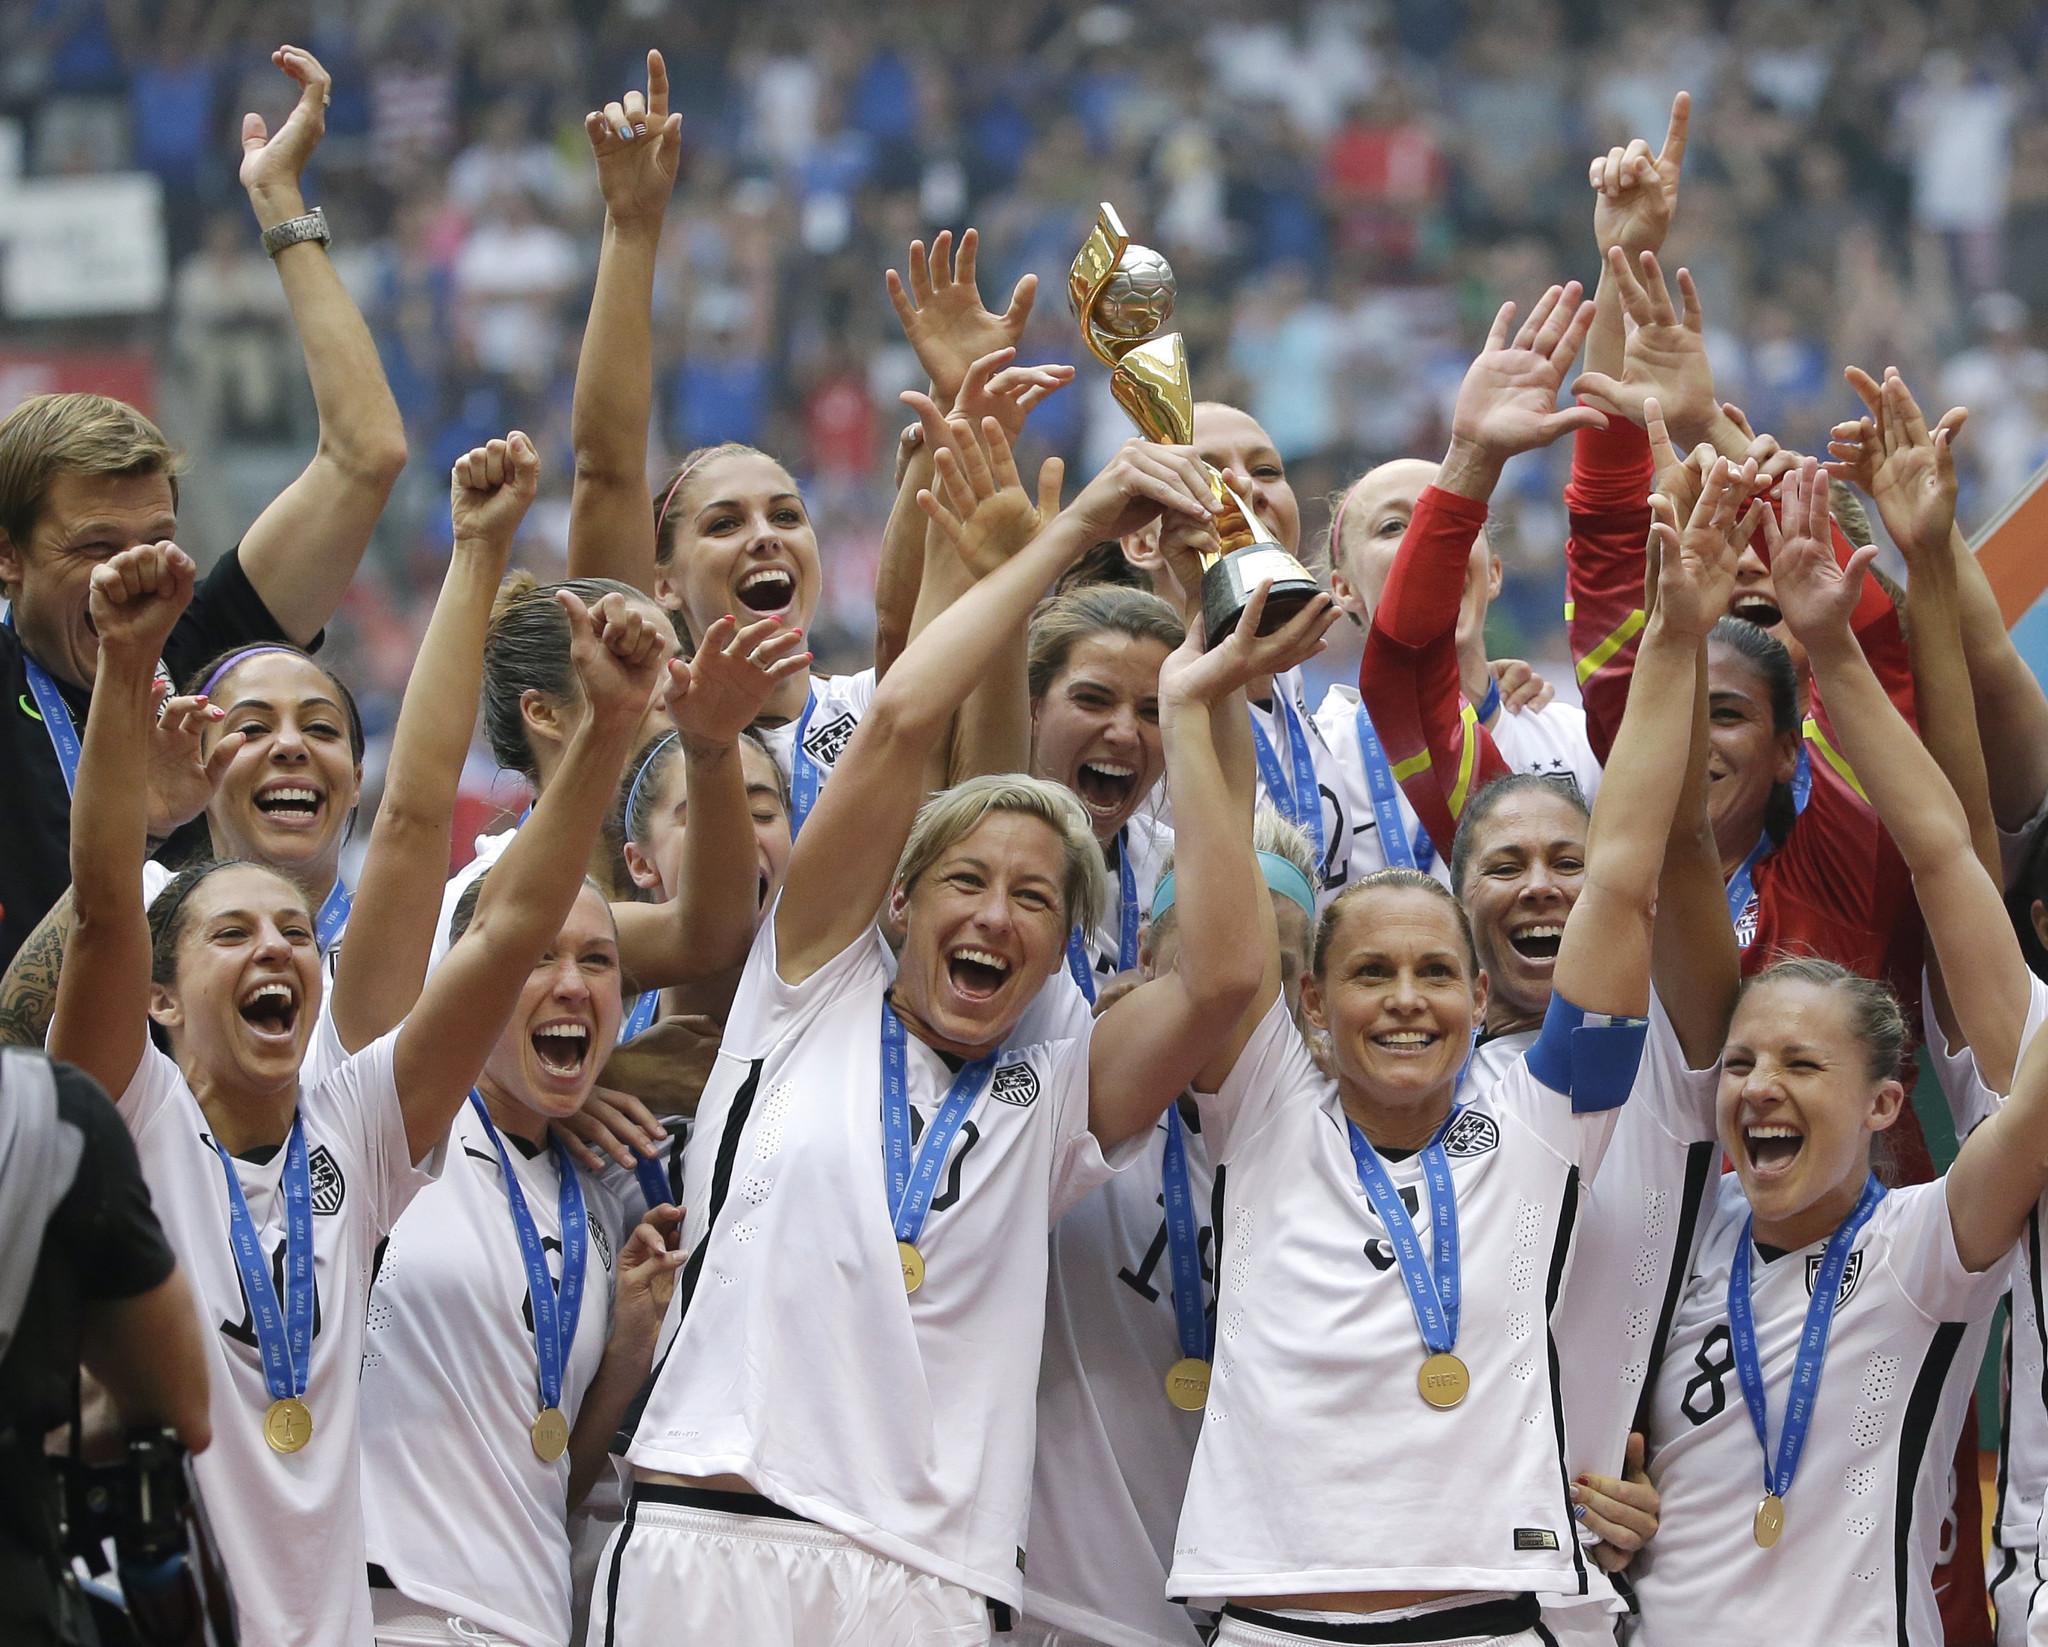 U.S. women's soccer team will play more often on grass fields – Chicago  Tribune